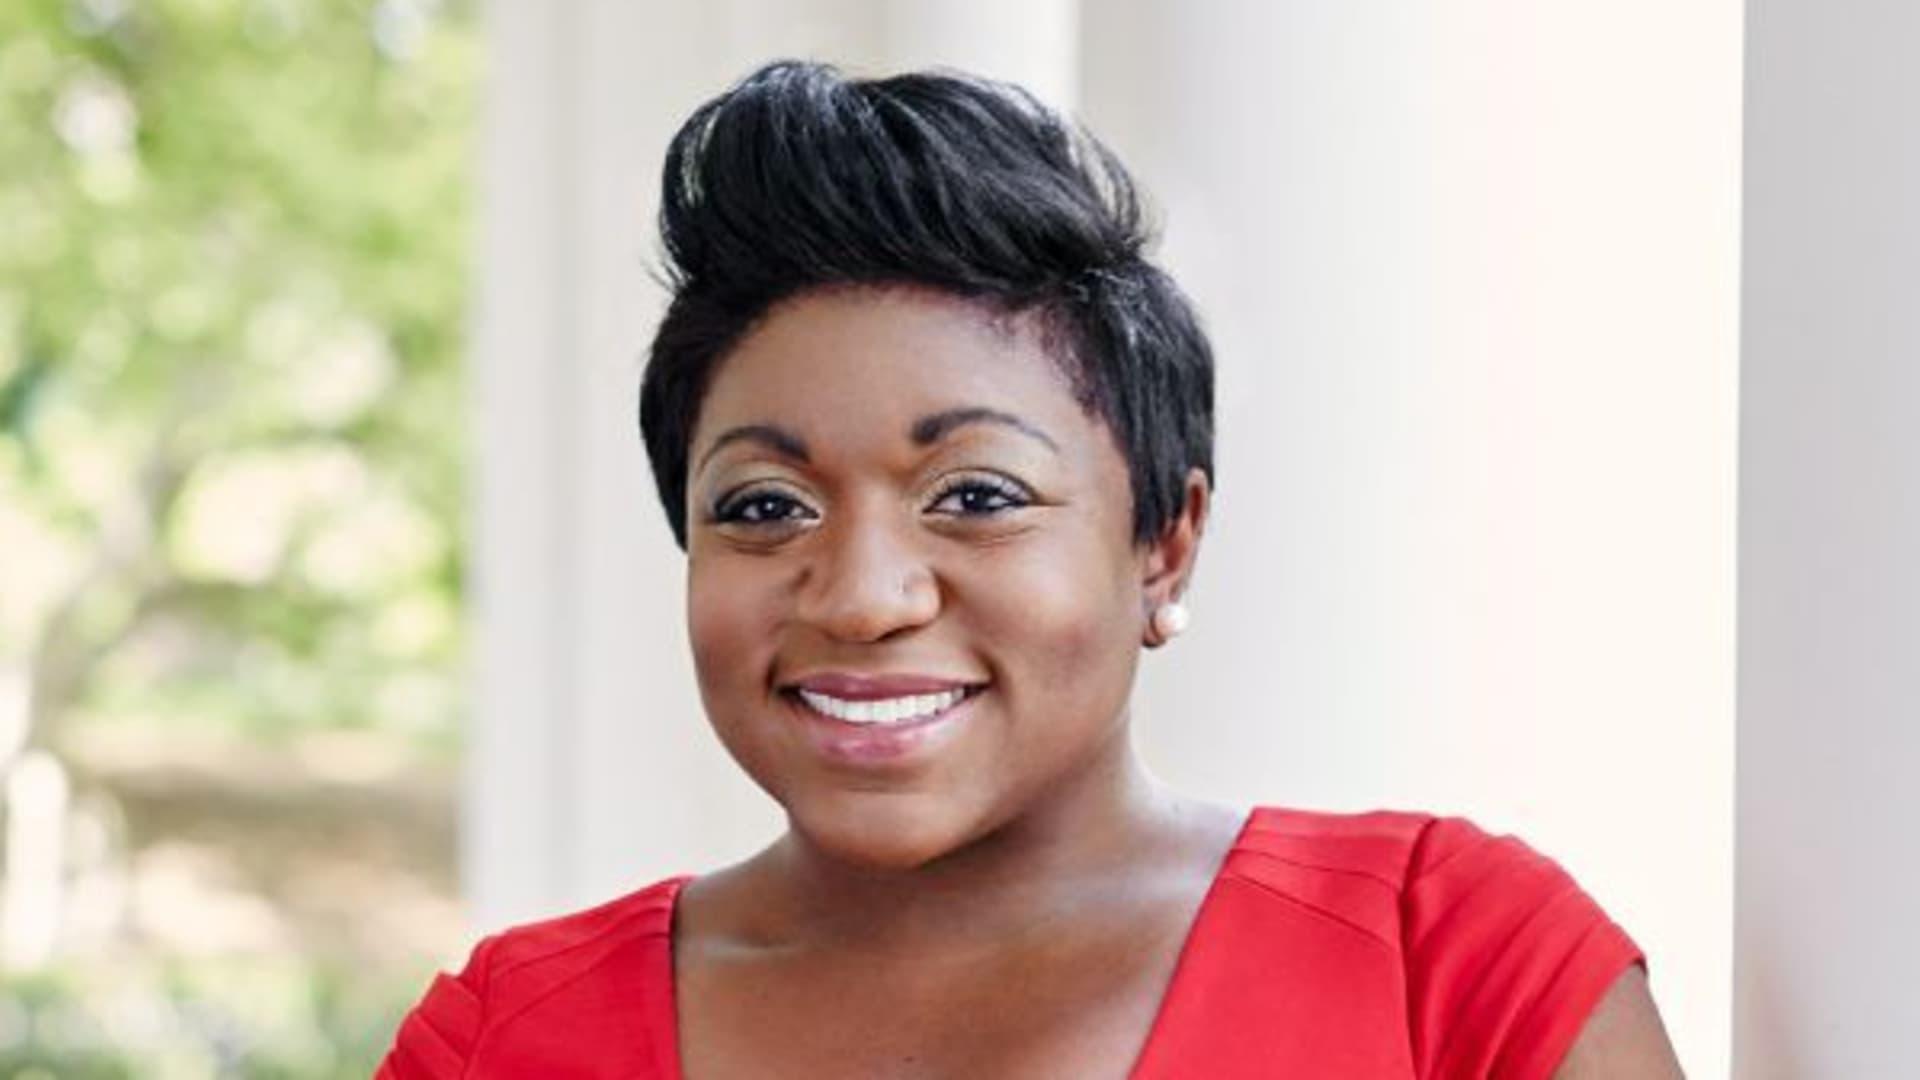 Deesha Dyer, Obama White House alum and founder of the Black Girl 44 Scholarship.